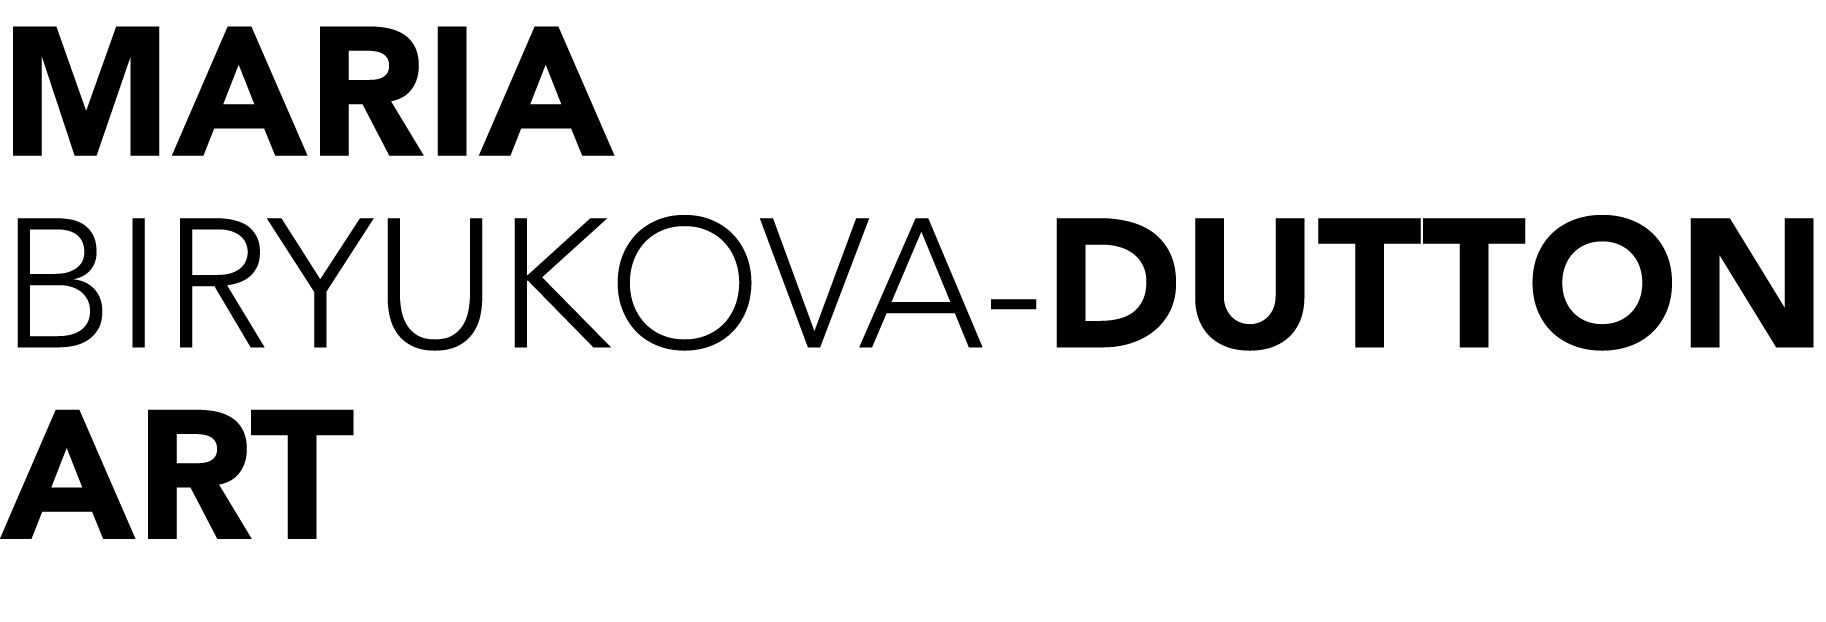 Maria Biryukova-Dutton Art